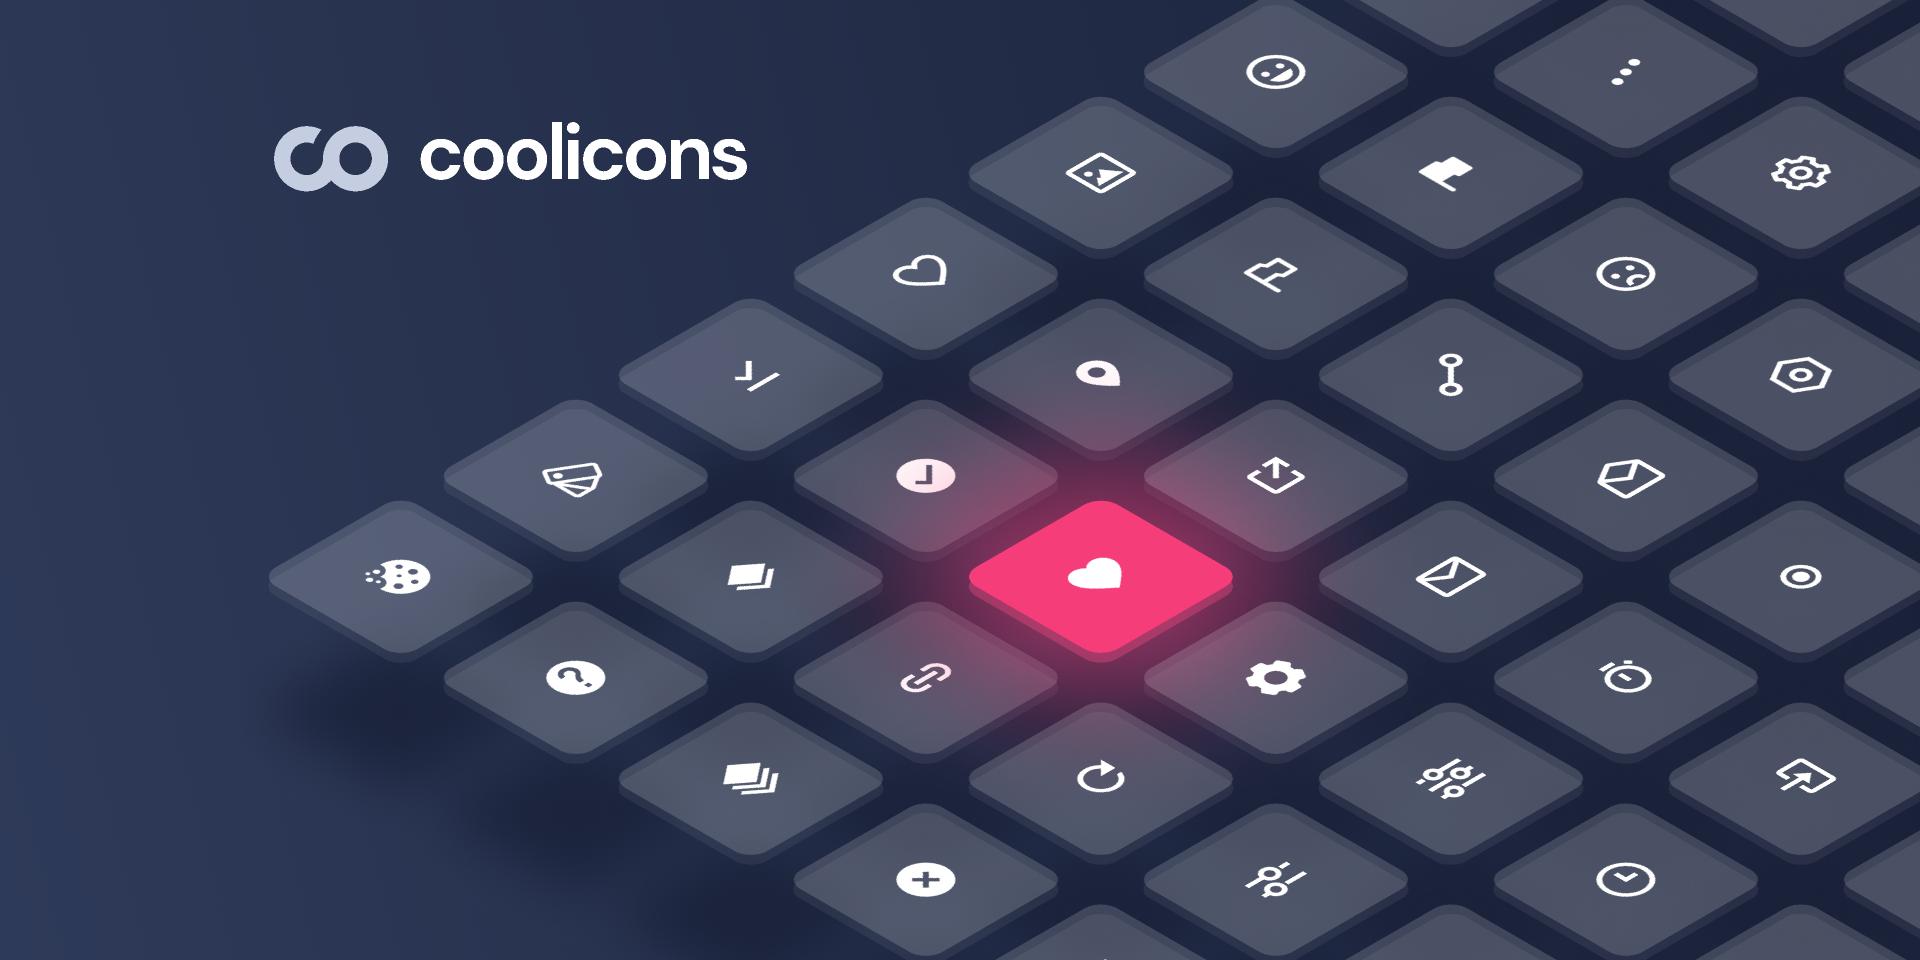 Figma Freebie coolicons | Free Iconset